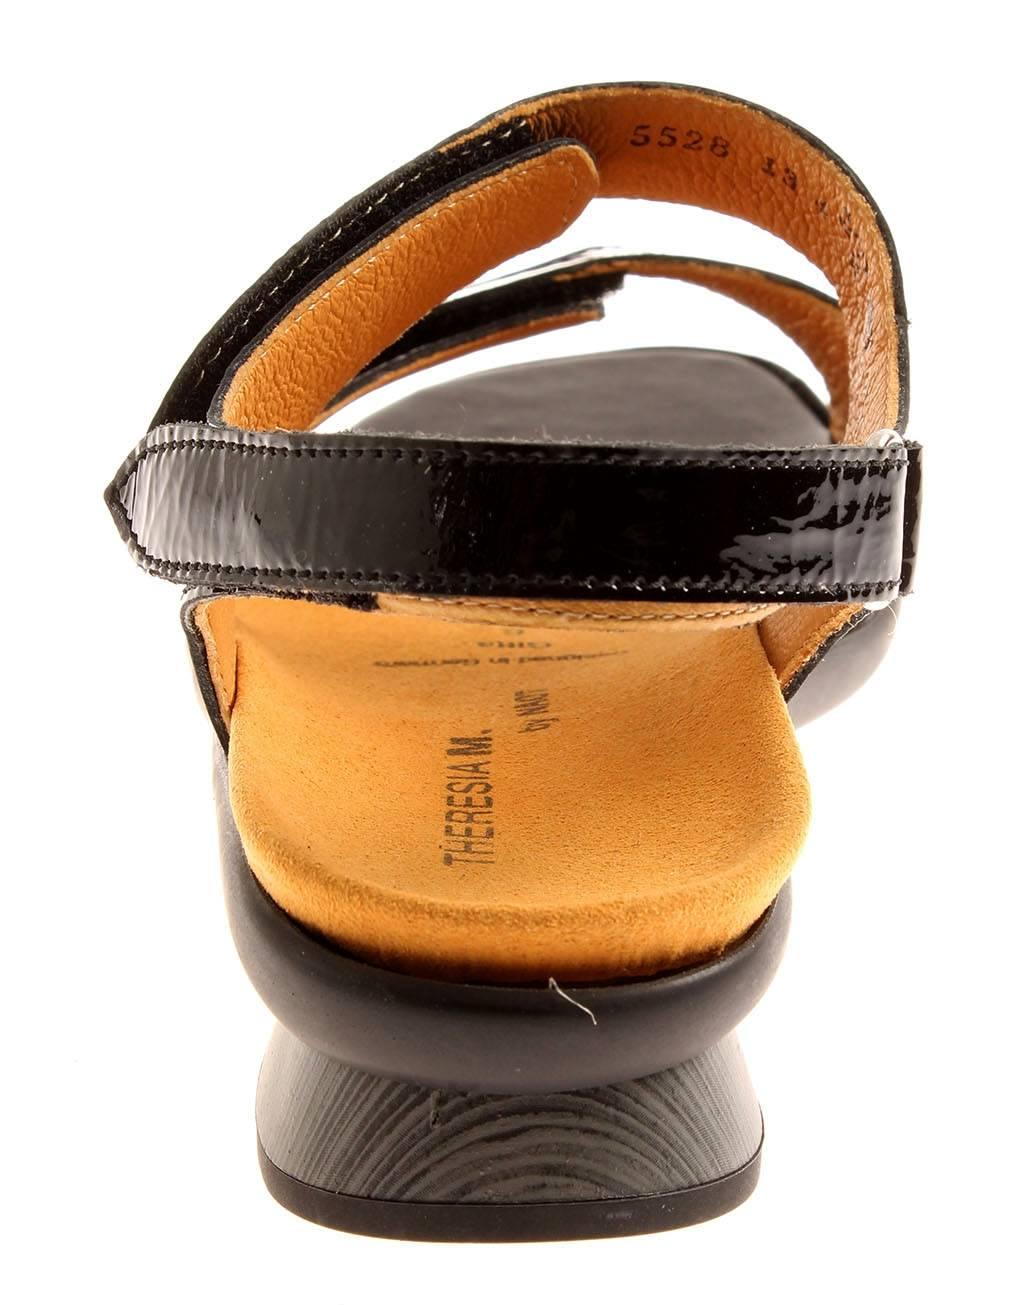 the latest 0111b 25605 Details zu Theresia M by Naot weiche Sandalen Damenschuhe Sommer Schuhe  M51316